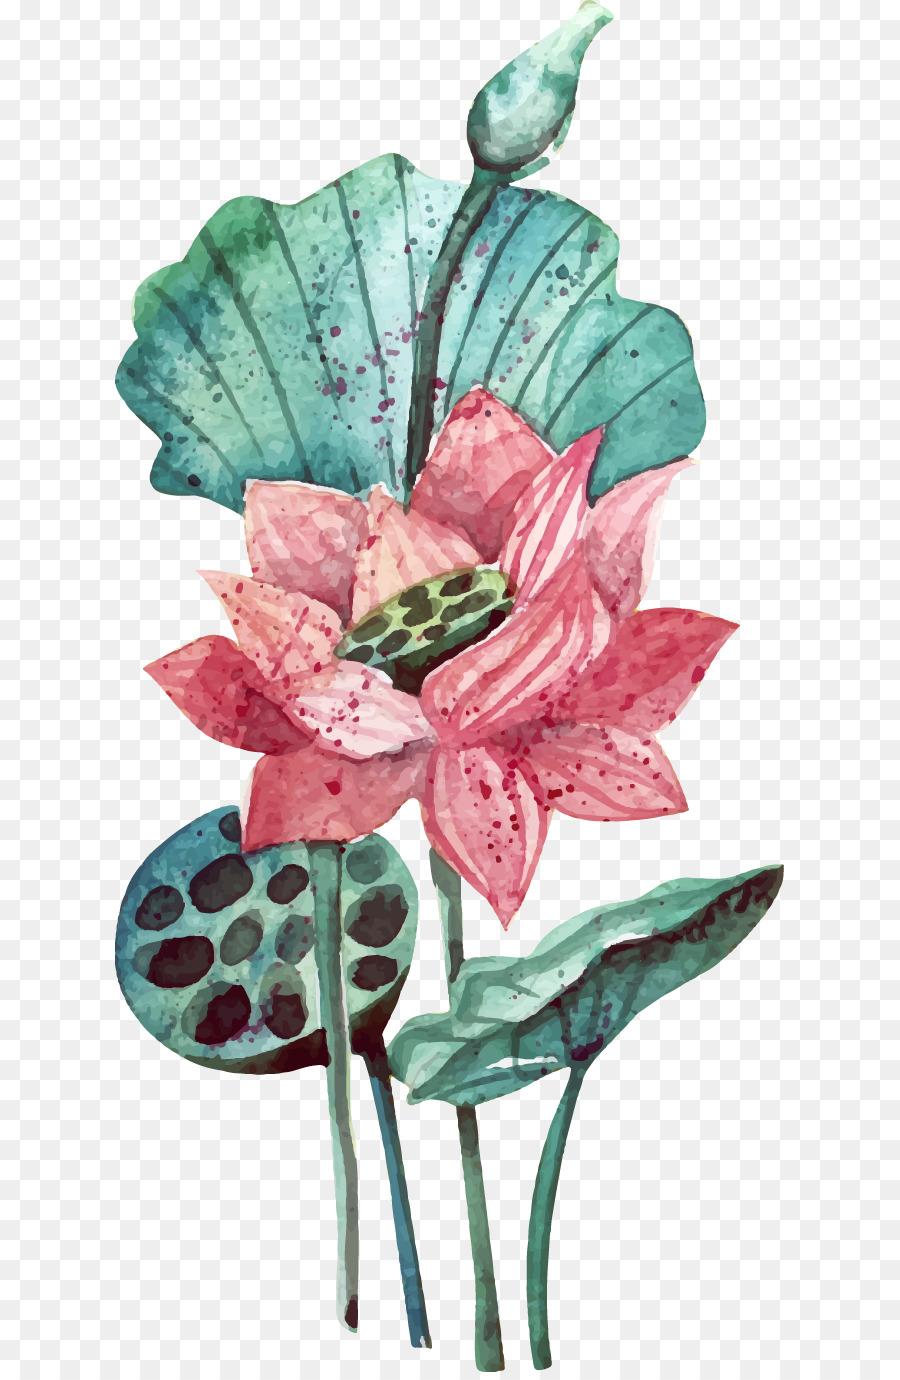 Watercolor Painting Flower Vector Hand Painted Lotus Lotus Png